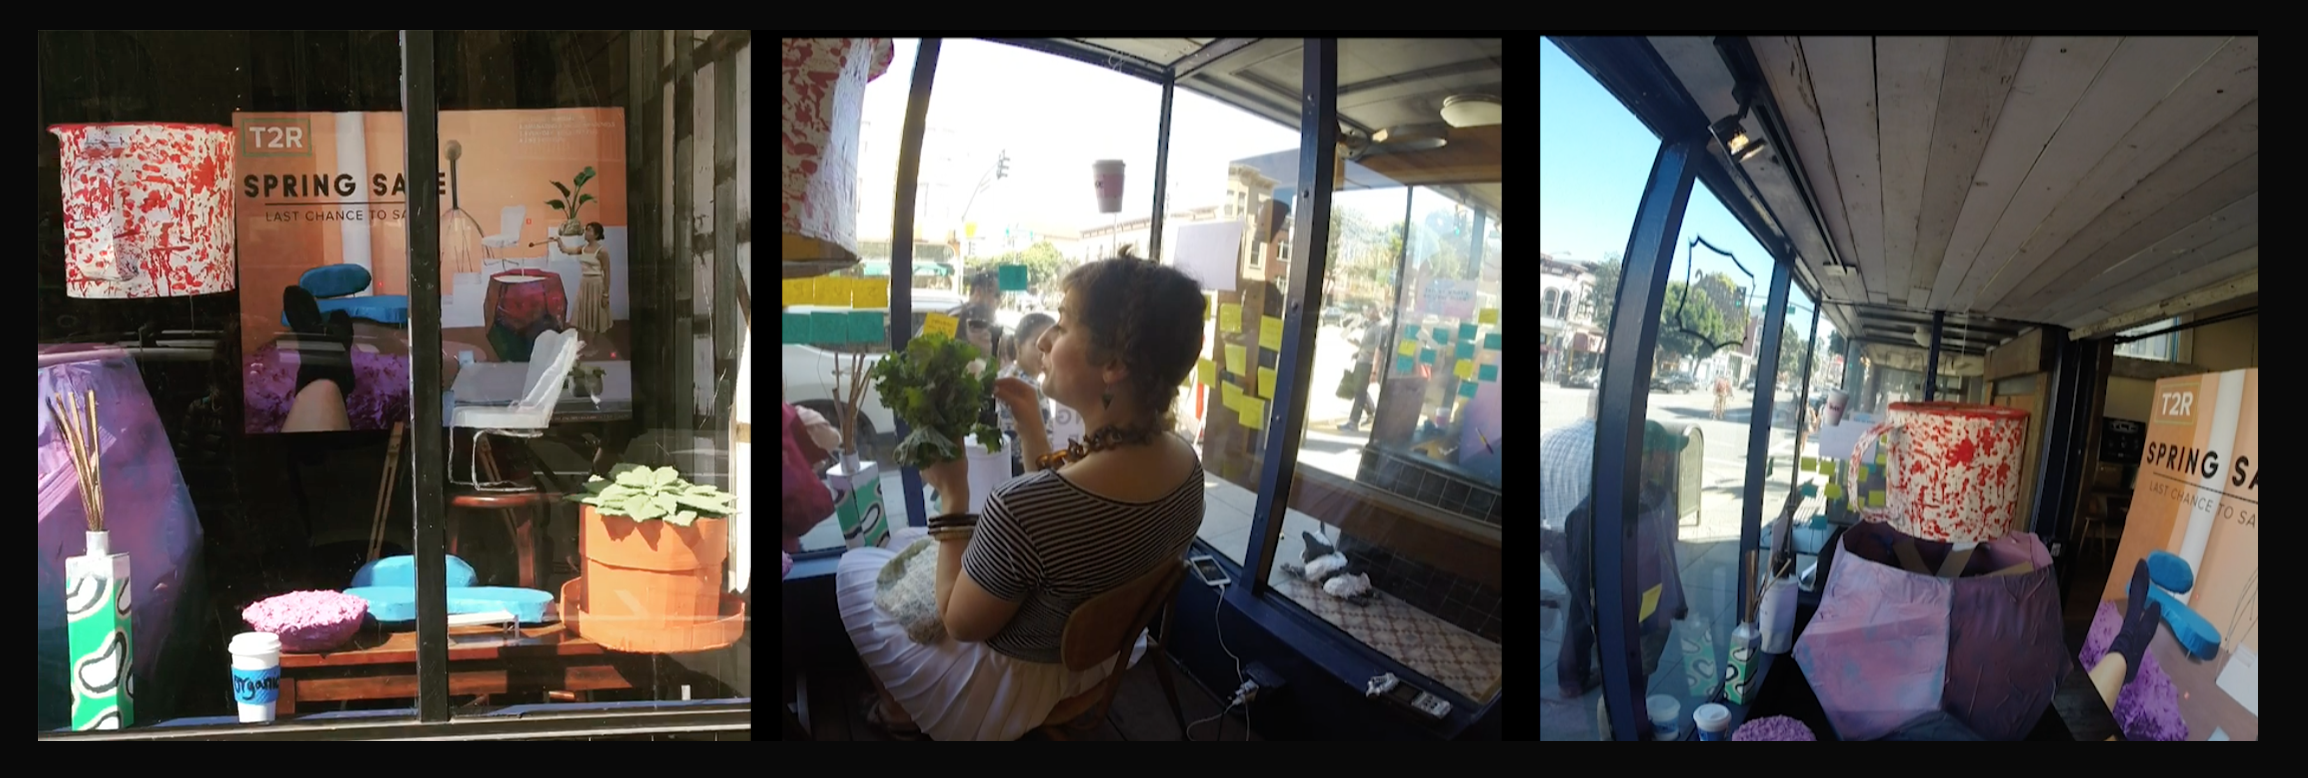 T2R Spring Sale    Video stills of storefront window installation, San Francisco, CA, 2017